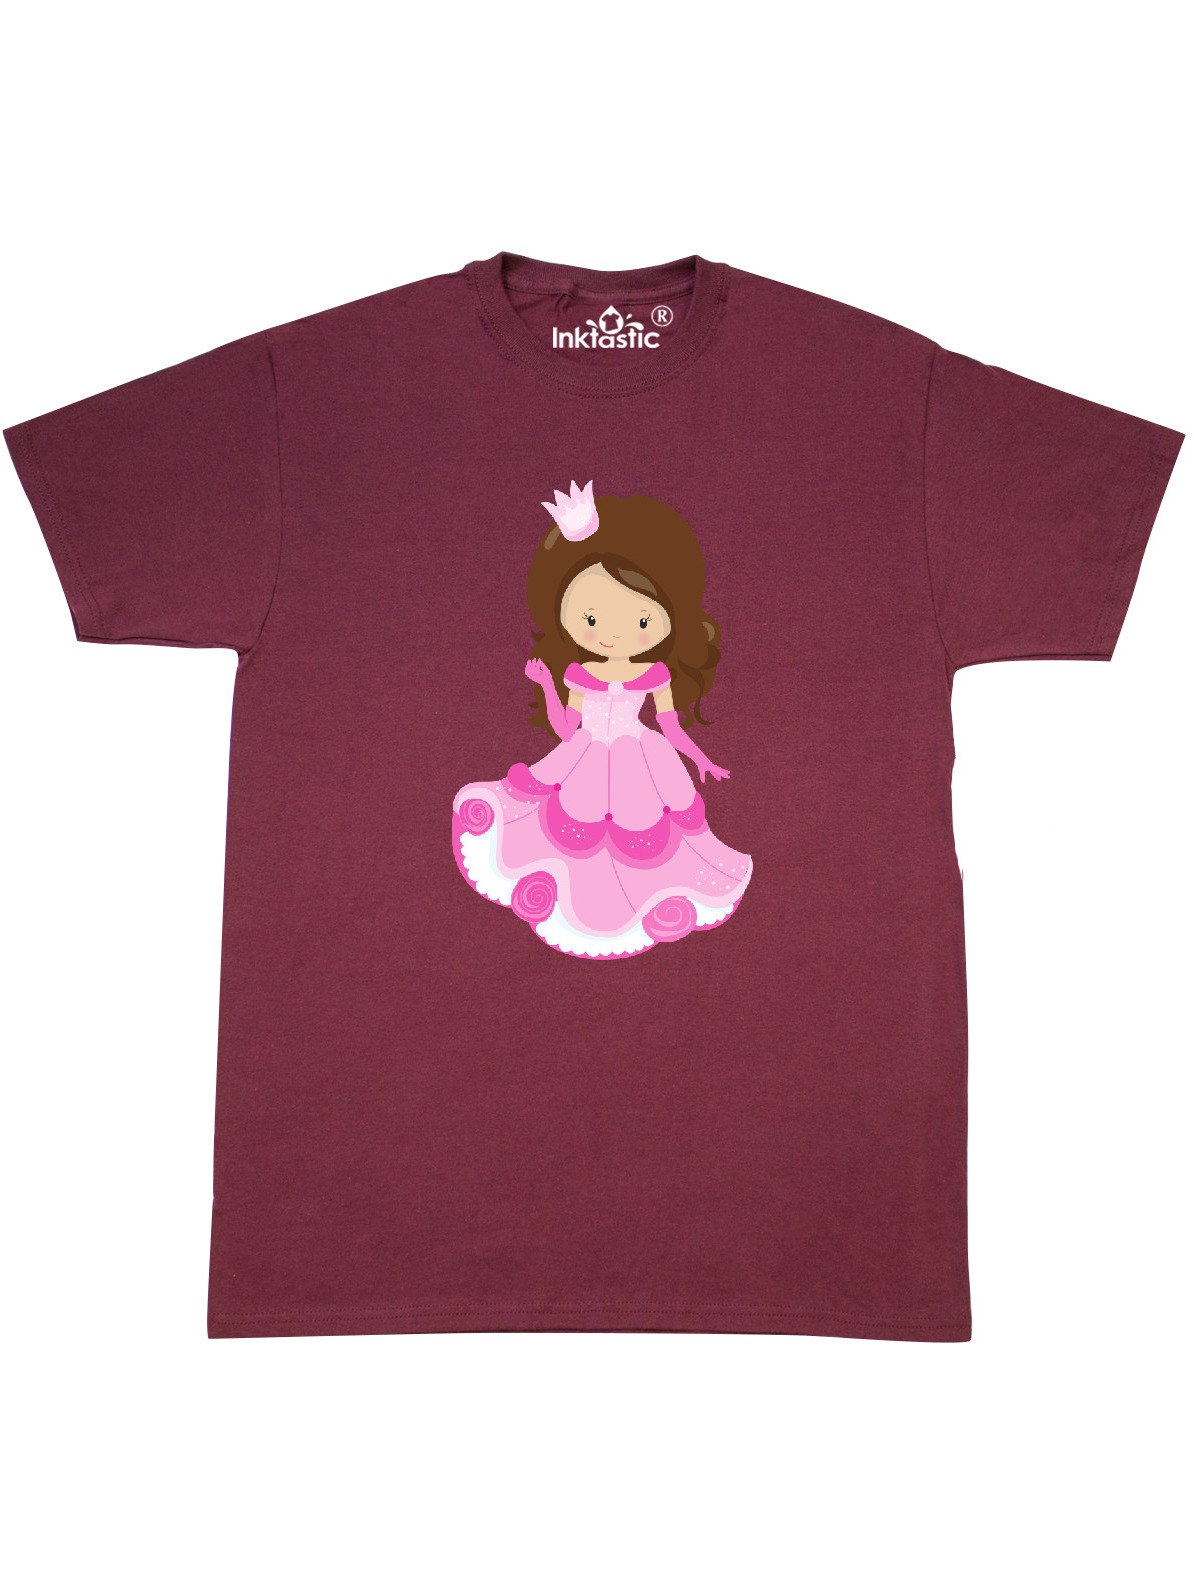 Princess in Pink Dress Toddler T-Shirt inktastic Cute Princess Orange Hair